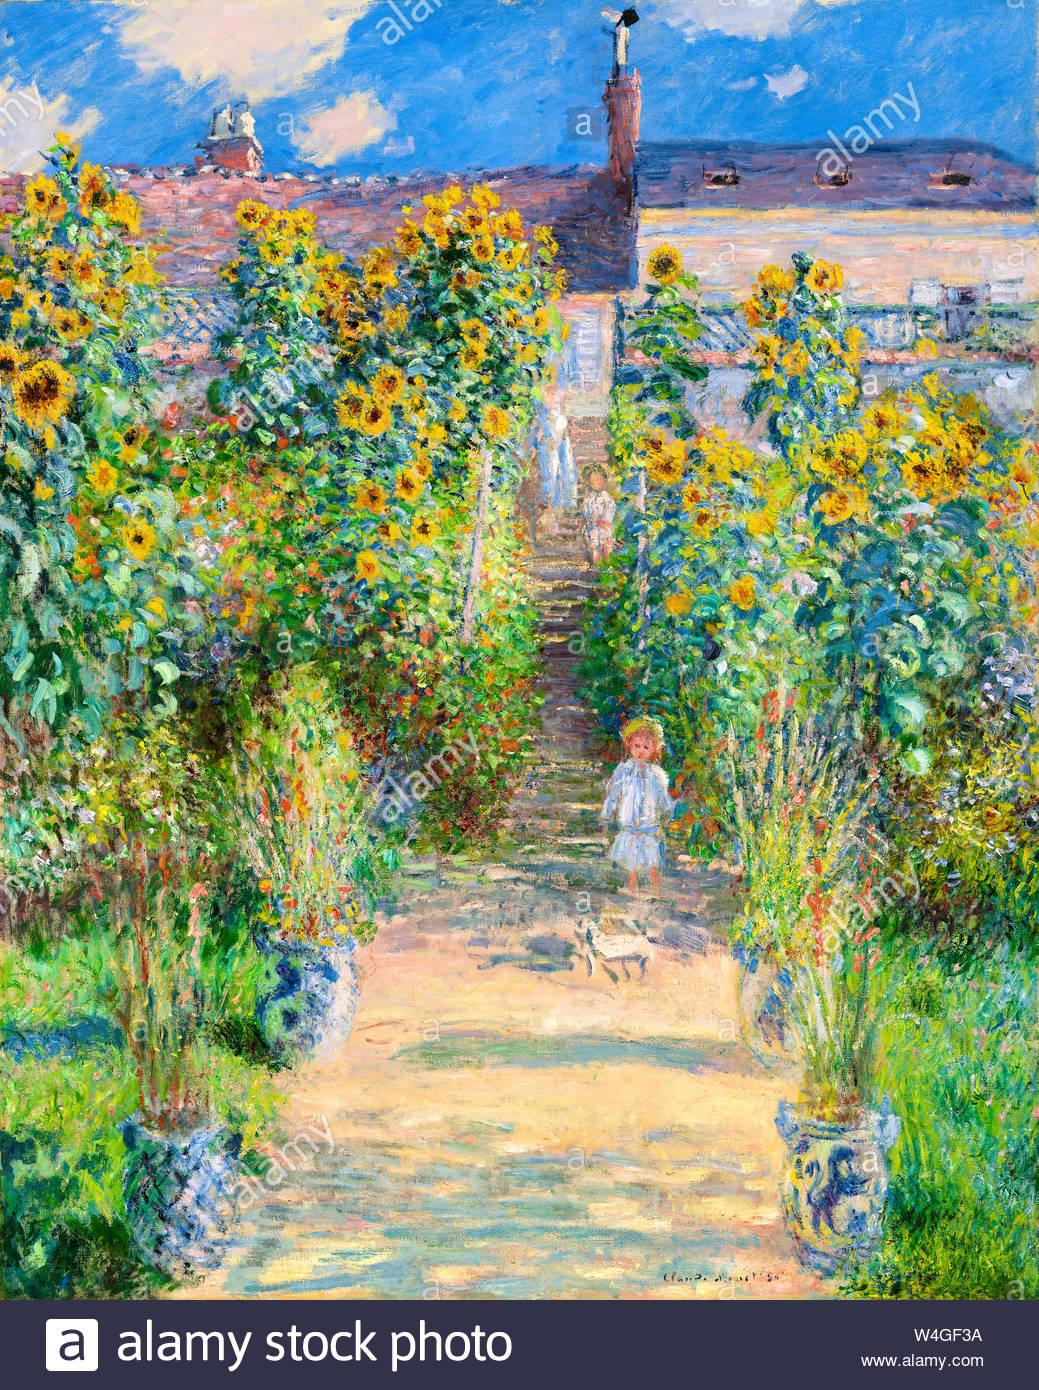 claude monet painting the artists garden at vtheuil 1881 W4GF3A